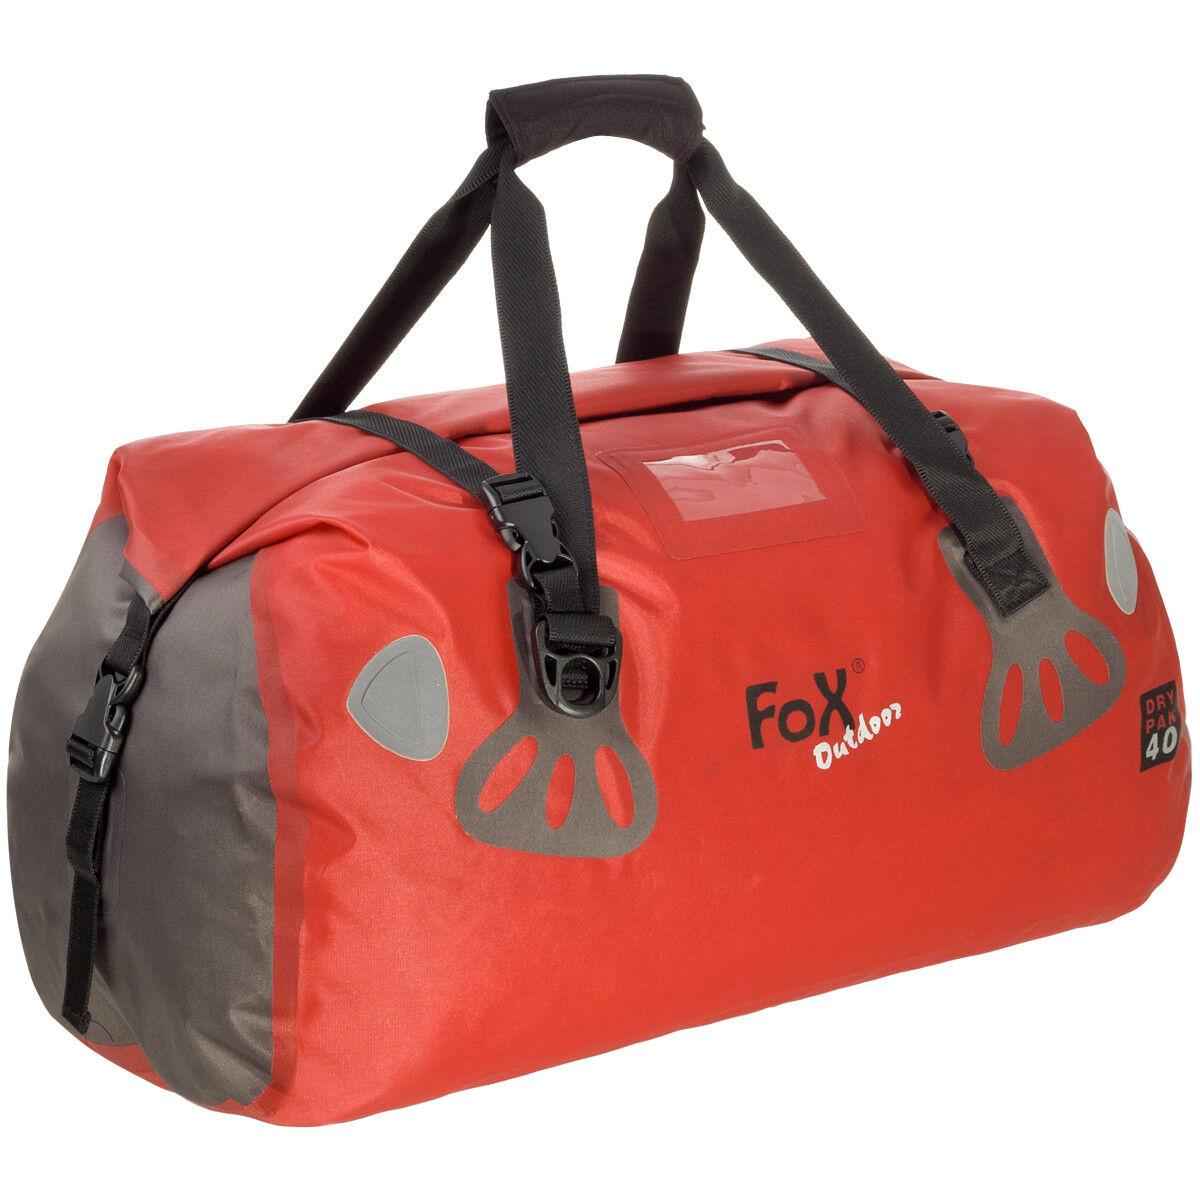 Fox Outdoor Bolsa de Lona Barco Impermeable DRY PAK 40 Kayak Barco Lona Rodar Paquete Rojo 5c3640